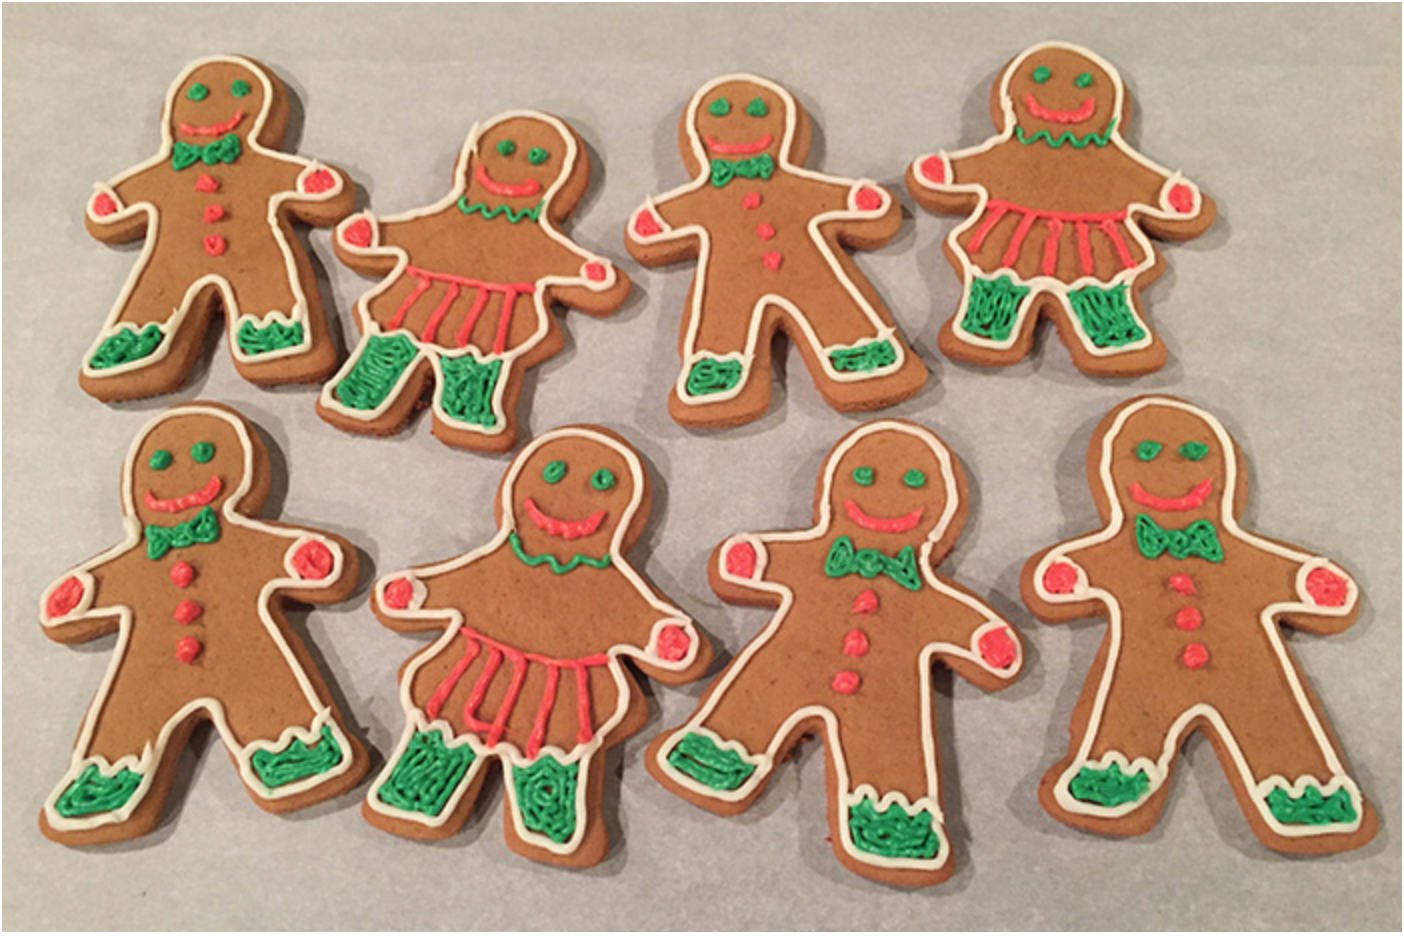 Gingerbreadmen mandi s-150x150